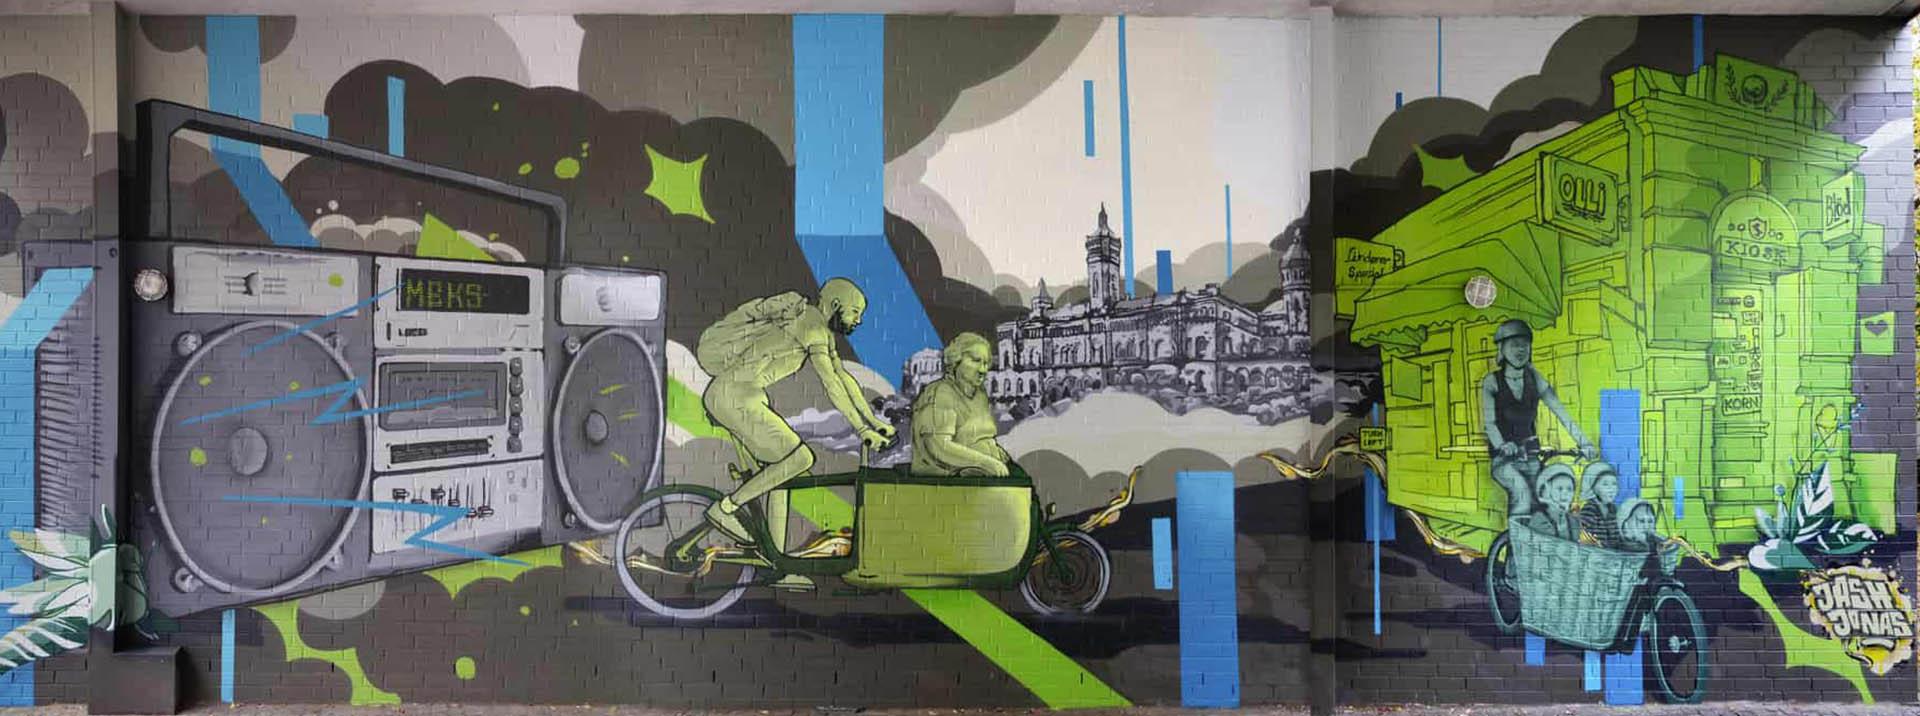 Boombox Hannover Graffiti